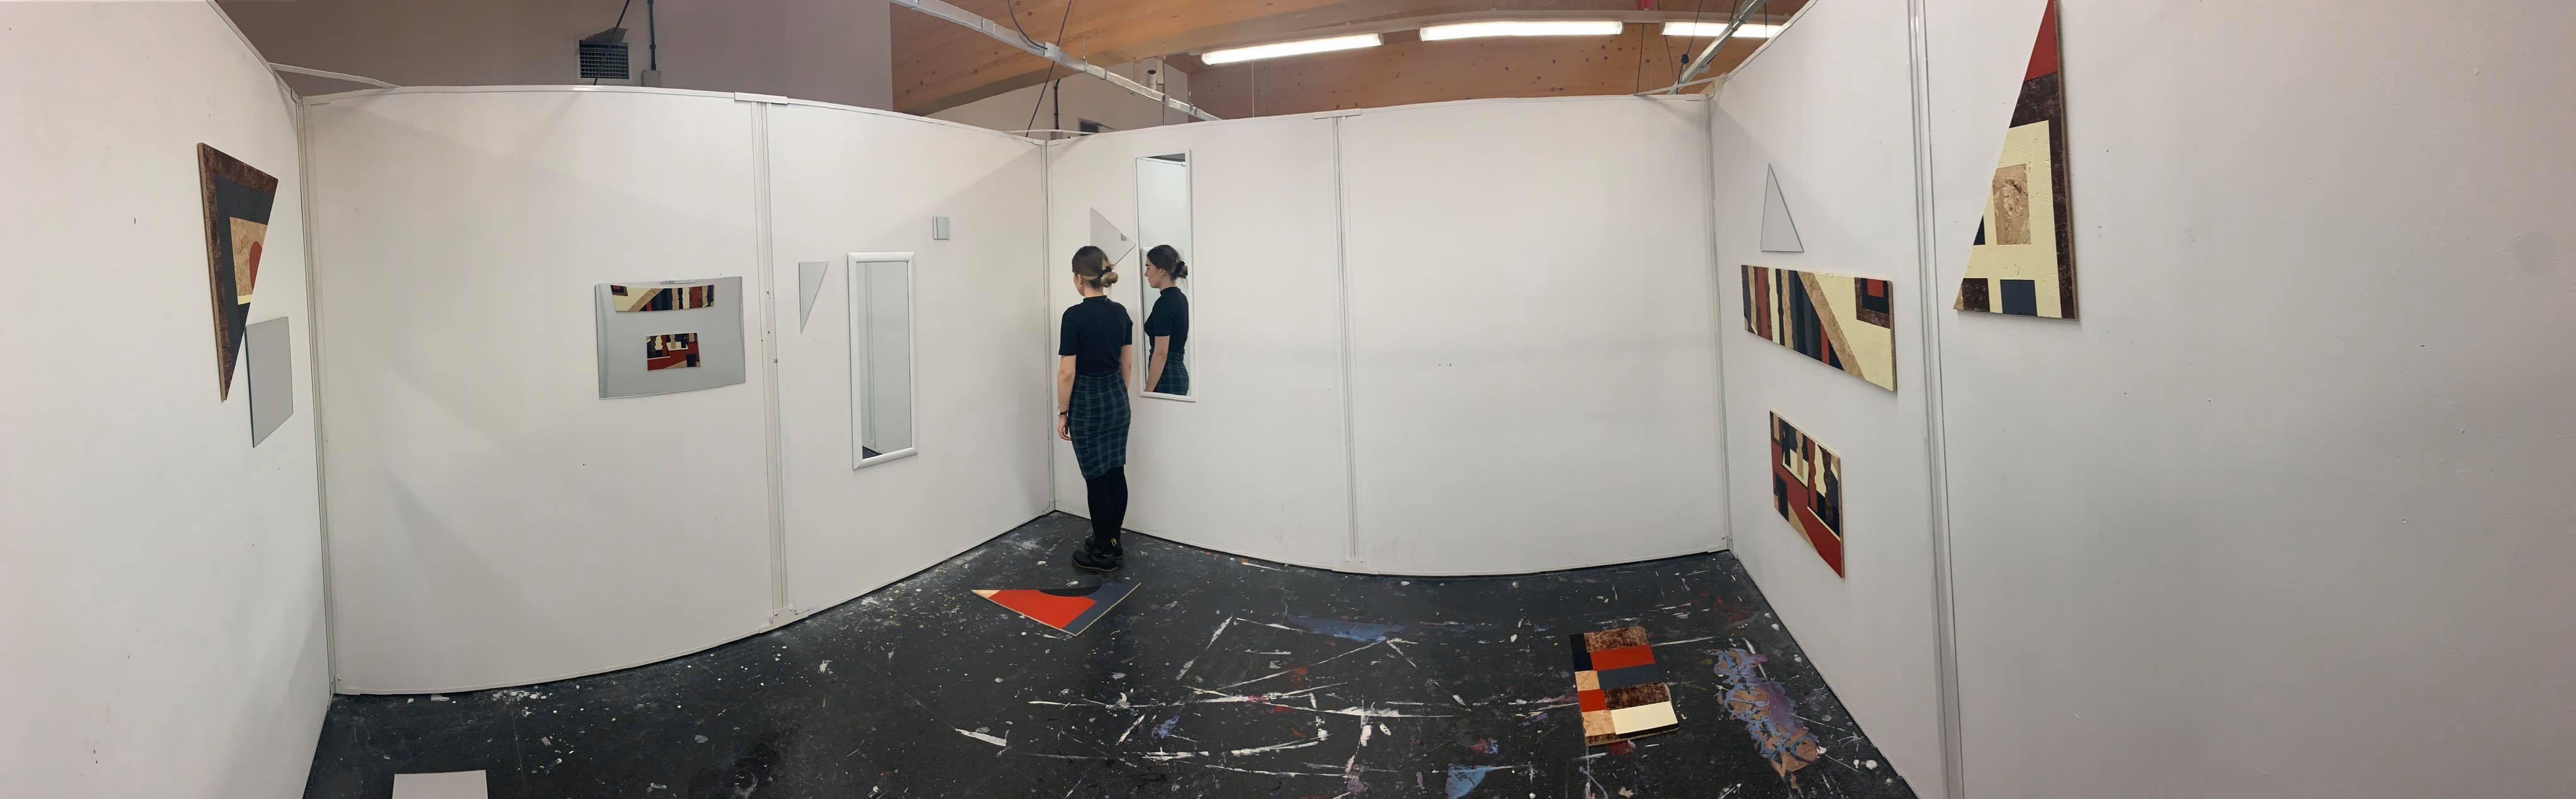 Memory Room (2020)